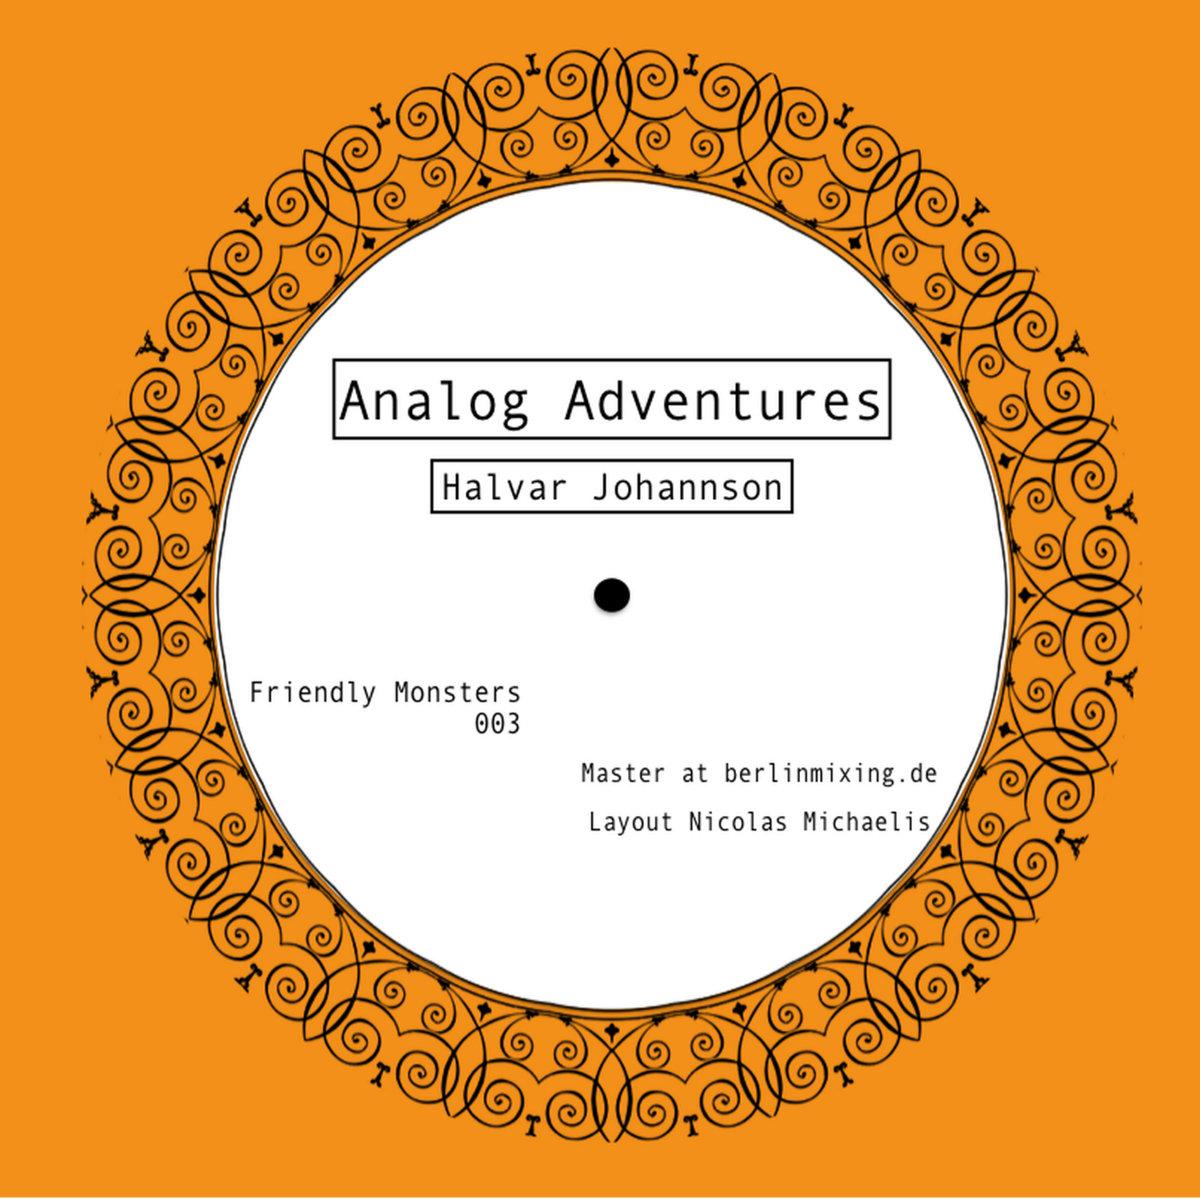 ad3f6ecf791c9 Analog Adventures